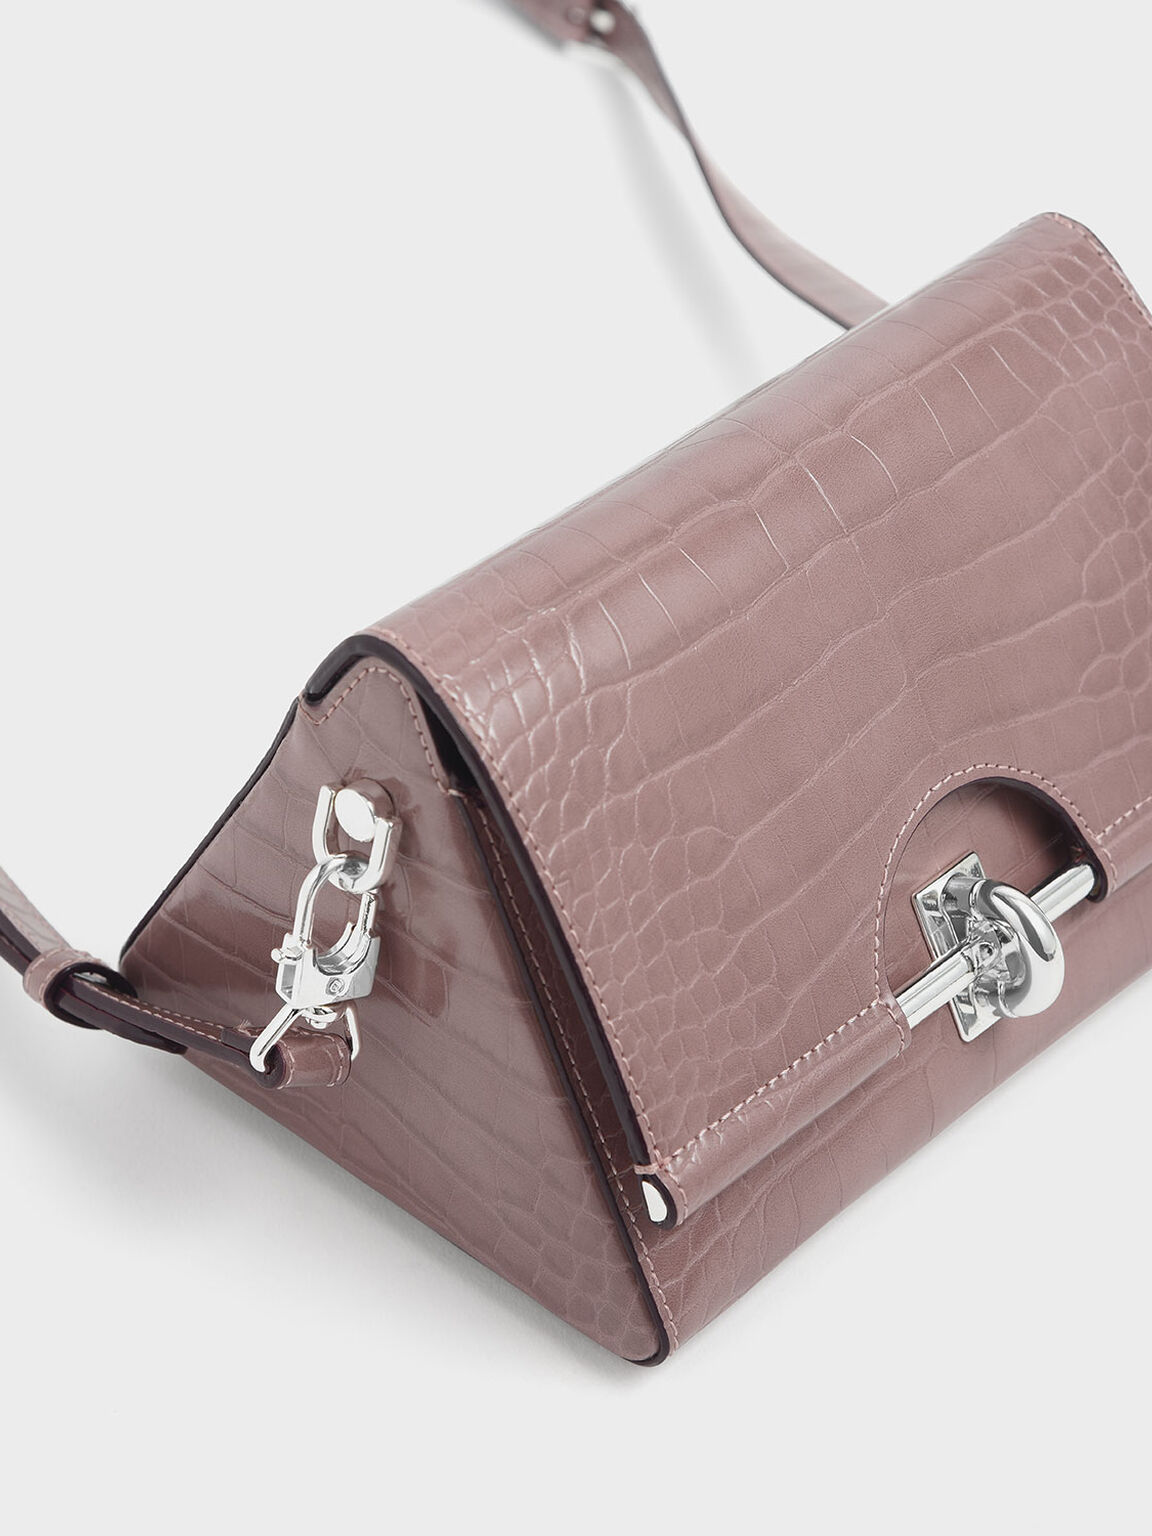 Croc-Effect Turn Lock Bag, Mauve, hi-res